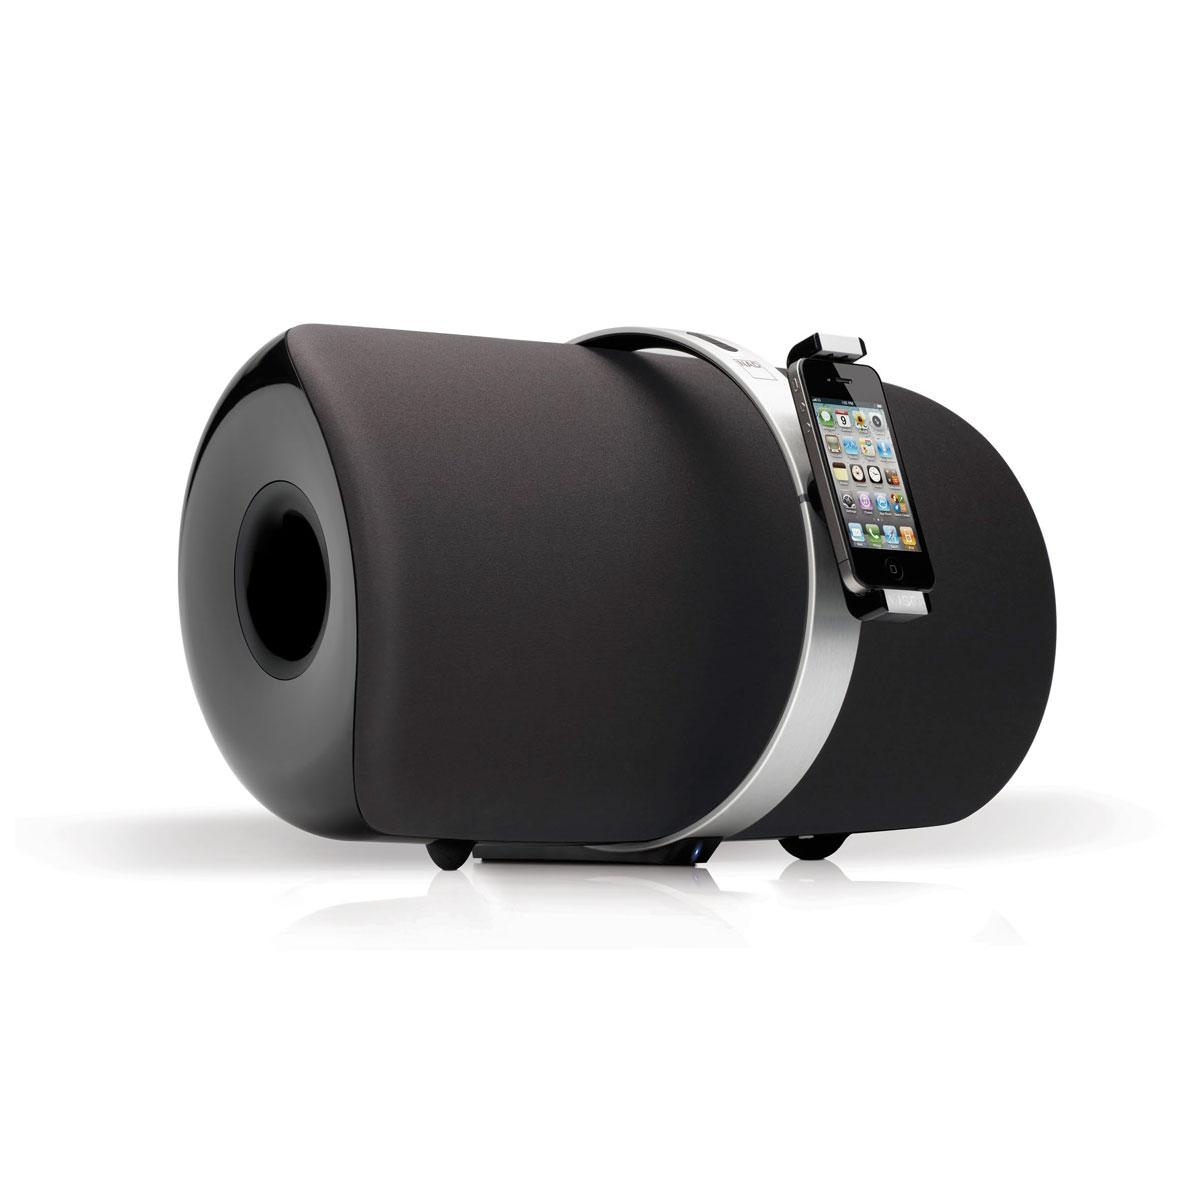 nad viso one apple ipod touch blanc 8 go dock enceinte bluetooth nad electronics. Black Bedroom Furniture Sets. Home Design Ideas